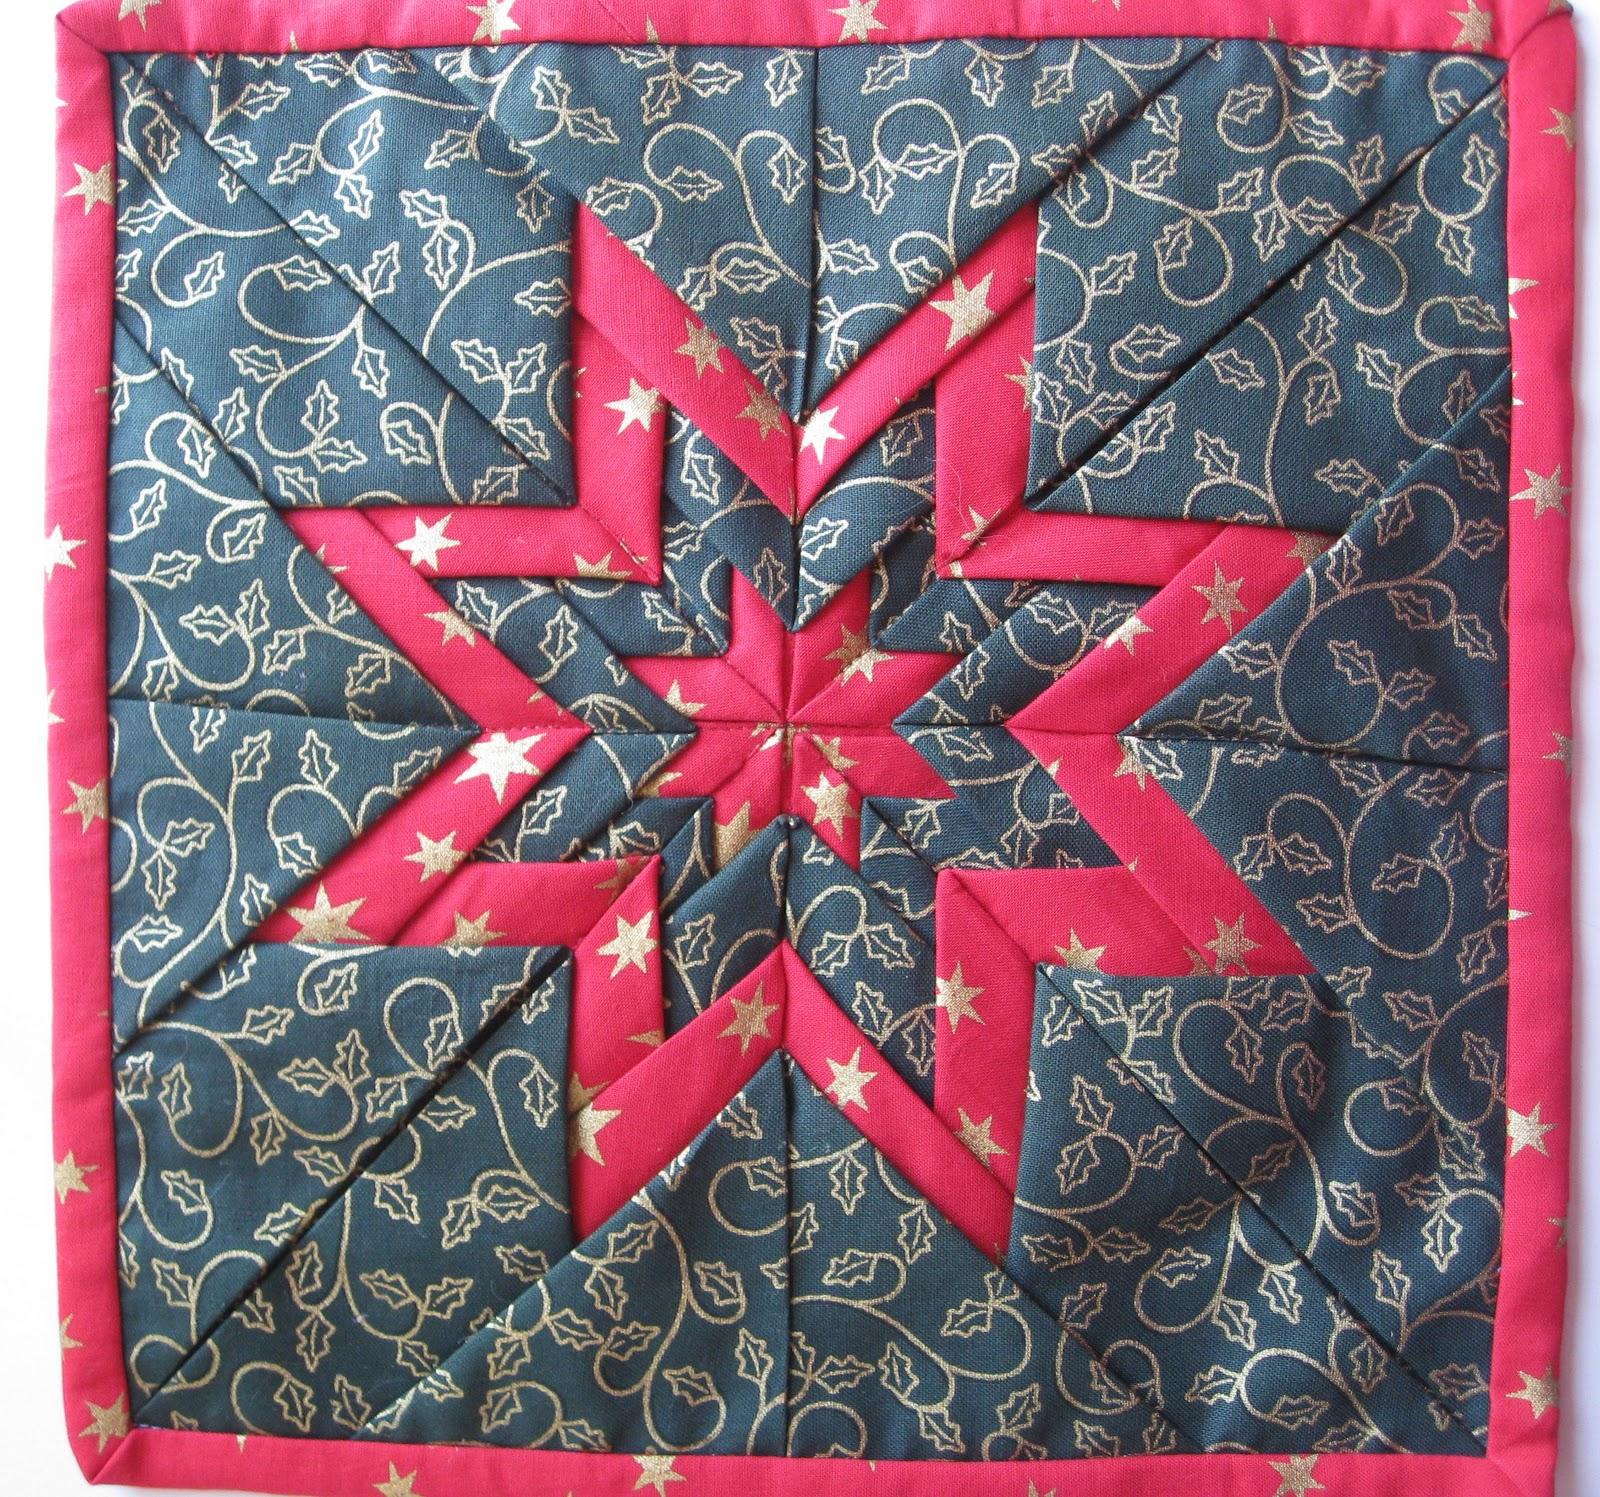 Vicki's Fabric Creations: Folded Star Mat-Tutorial Uploaded : folded star quilt block - Adamdwight.com